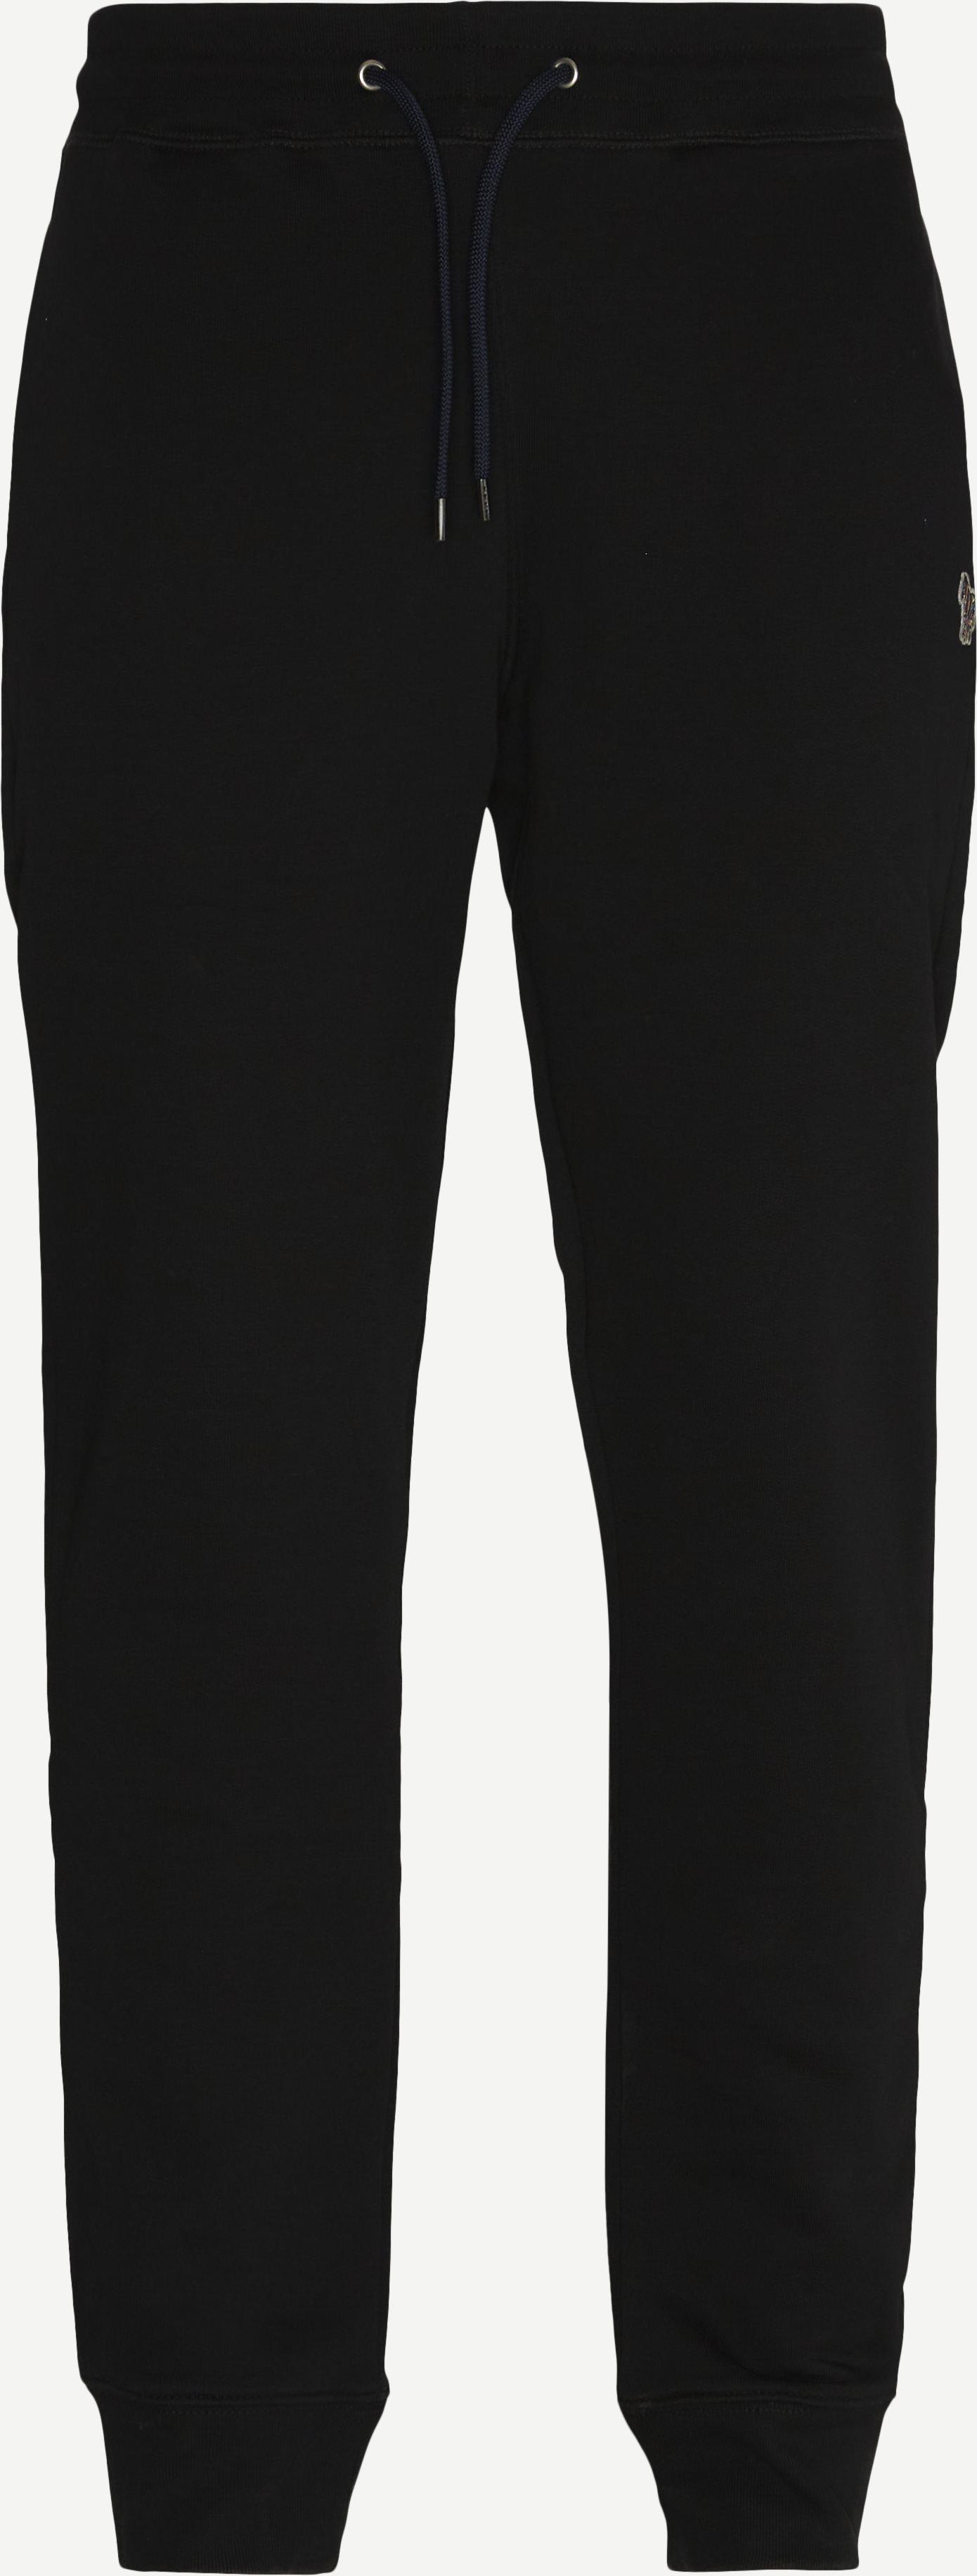 Hosen - Regular fit - Schwarz